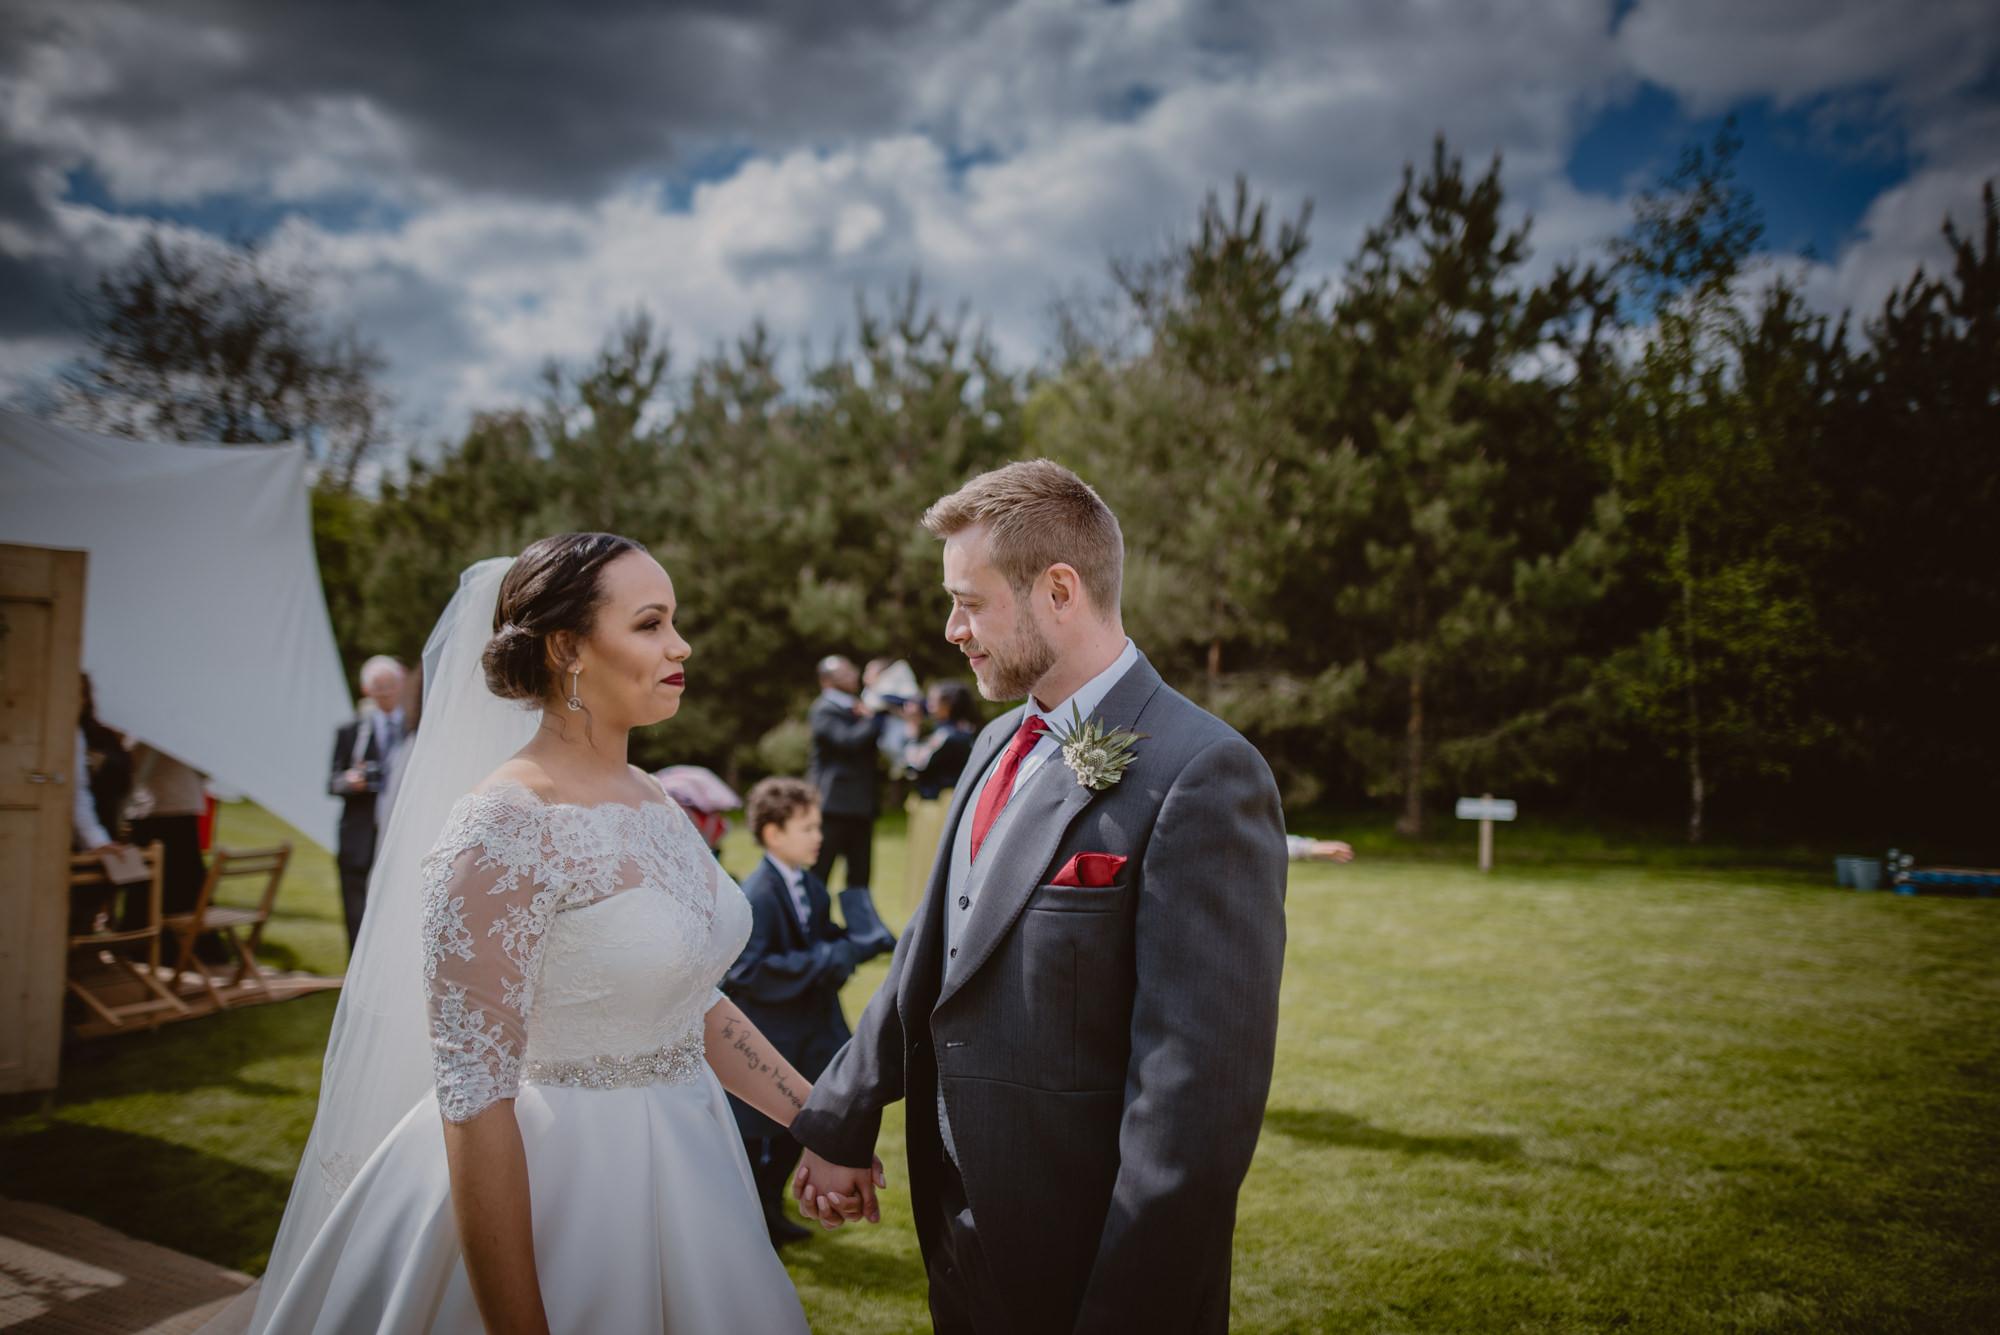 Jacqueline-Gareth-Wedding-Westmead-Events-Surrey-Manu-Mendoza-Wedding-Photography-284.jpg